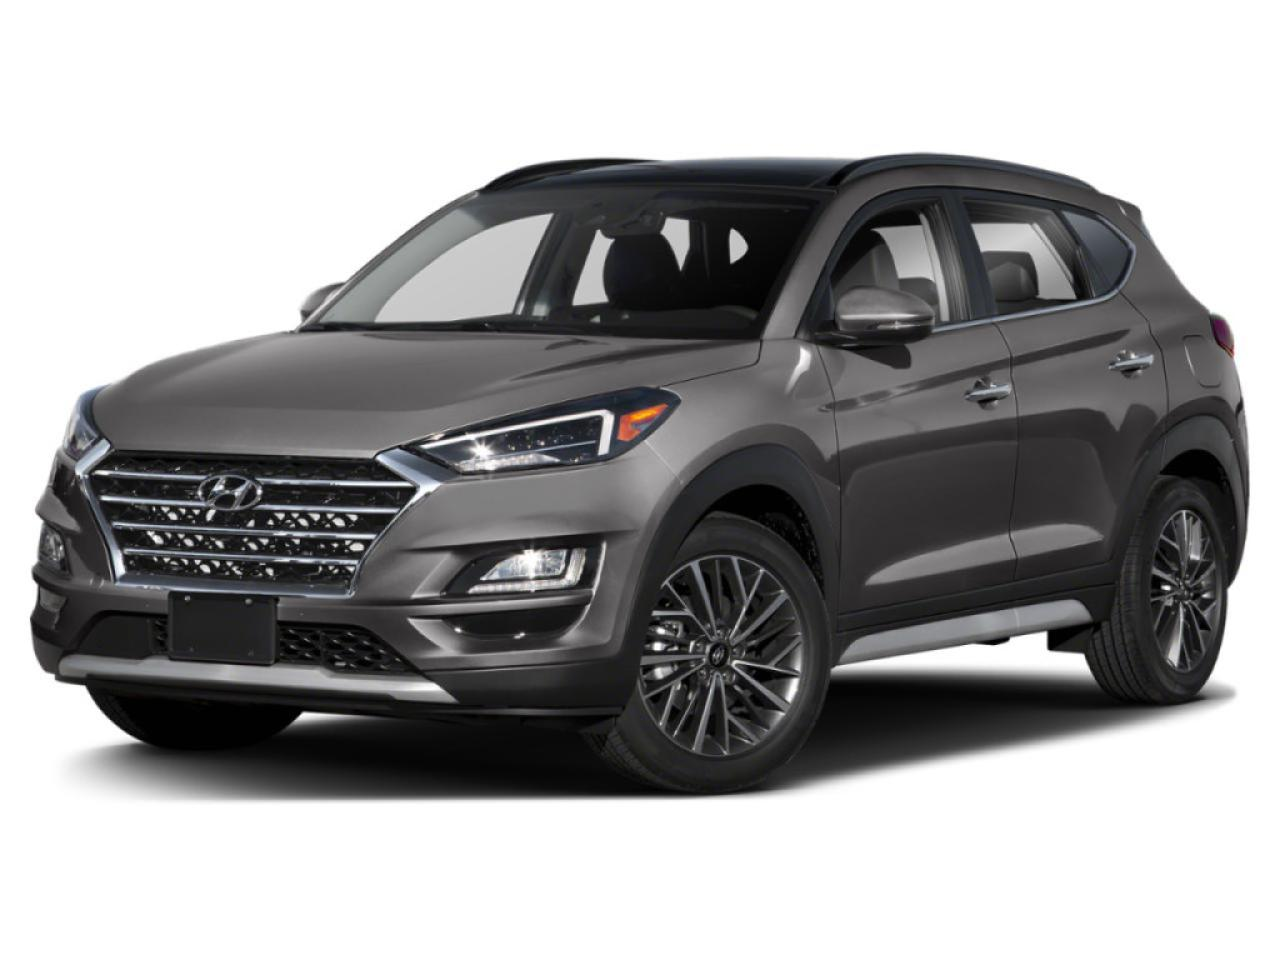 2019 Hyundai Tucson 2.0L Preferred FWD NO OPTIONS